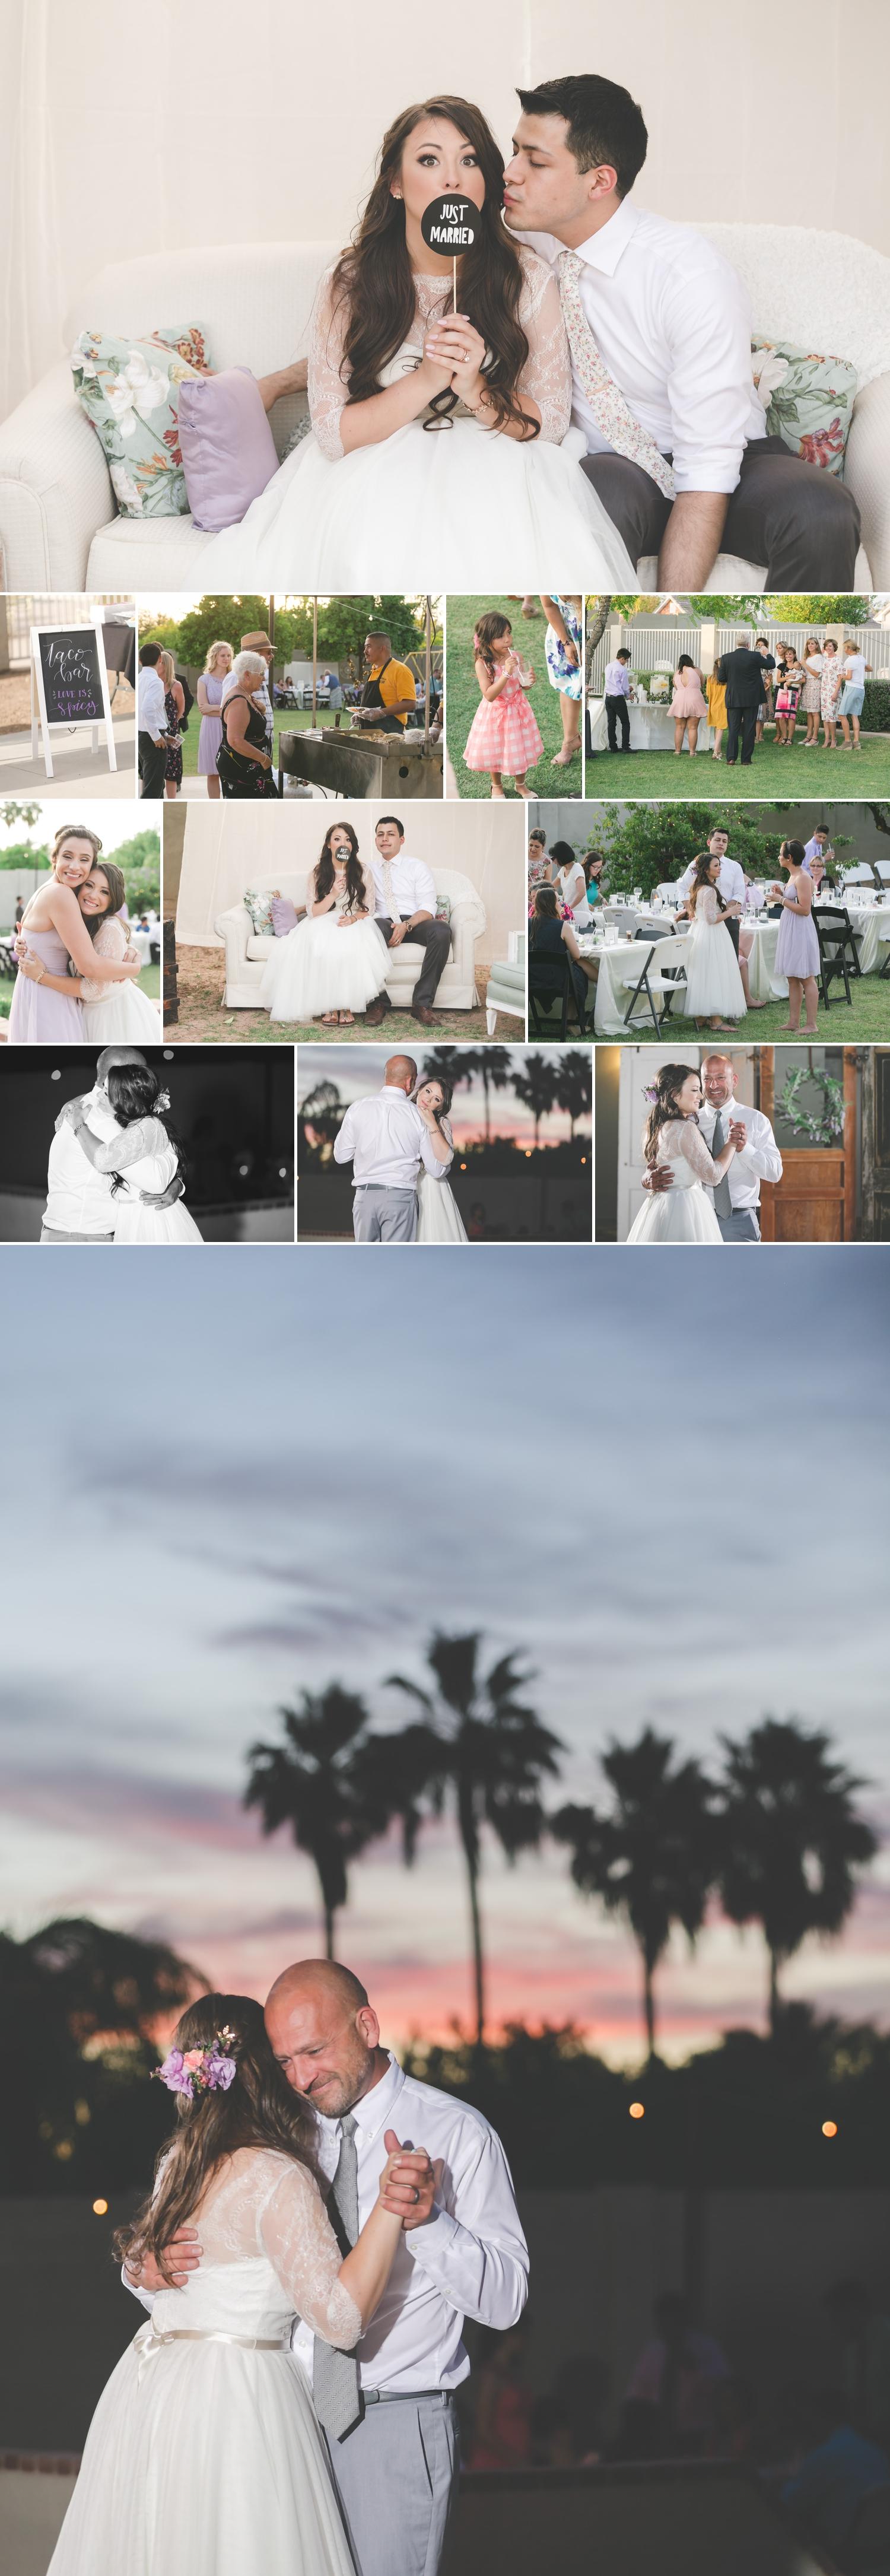 Krassa Wedding blog 13.jpg